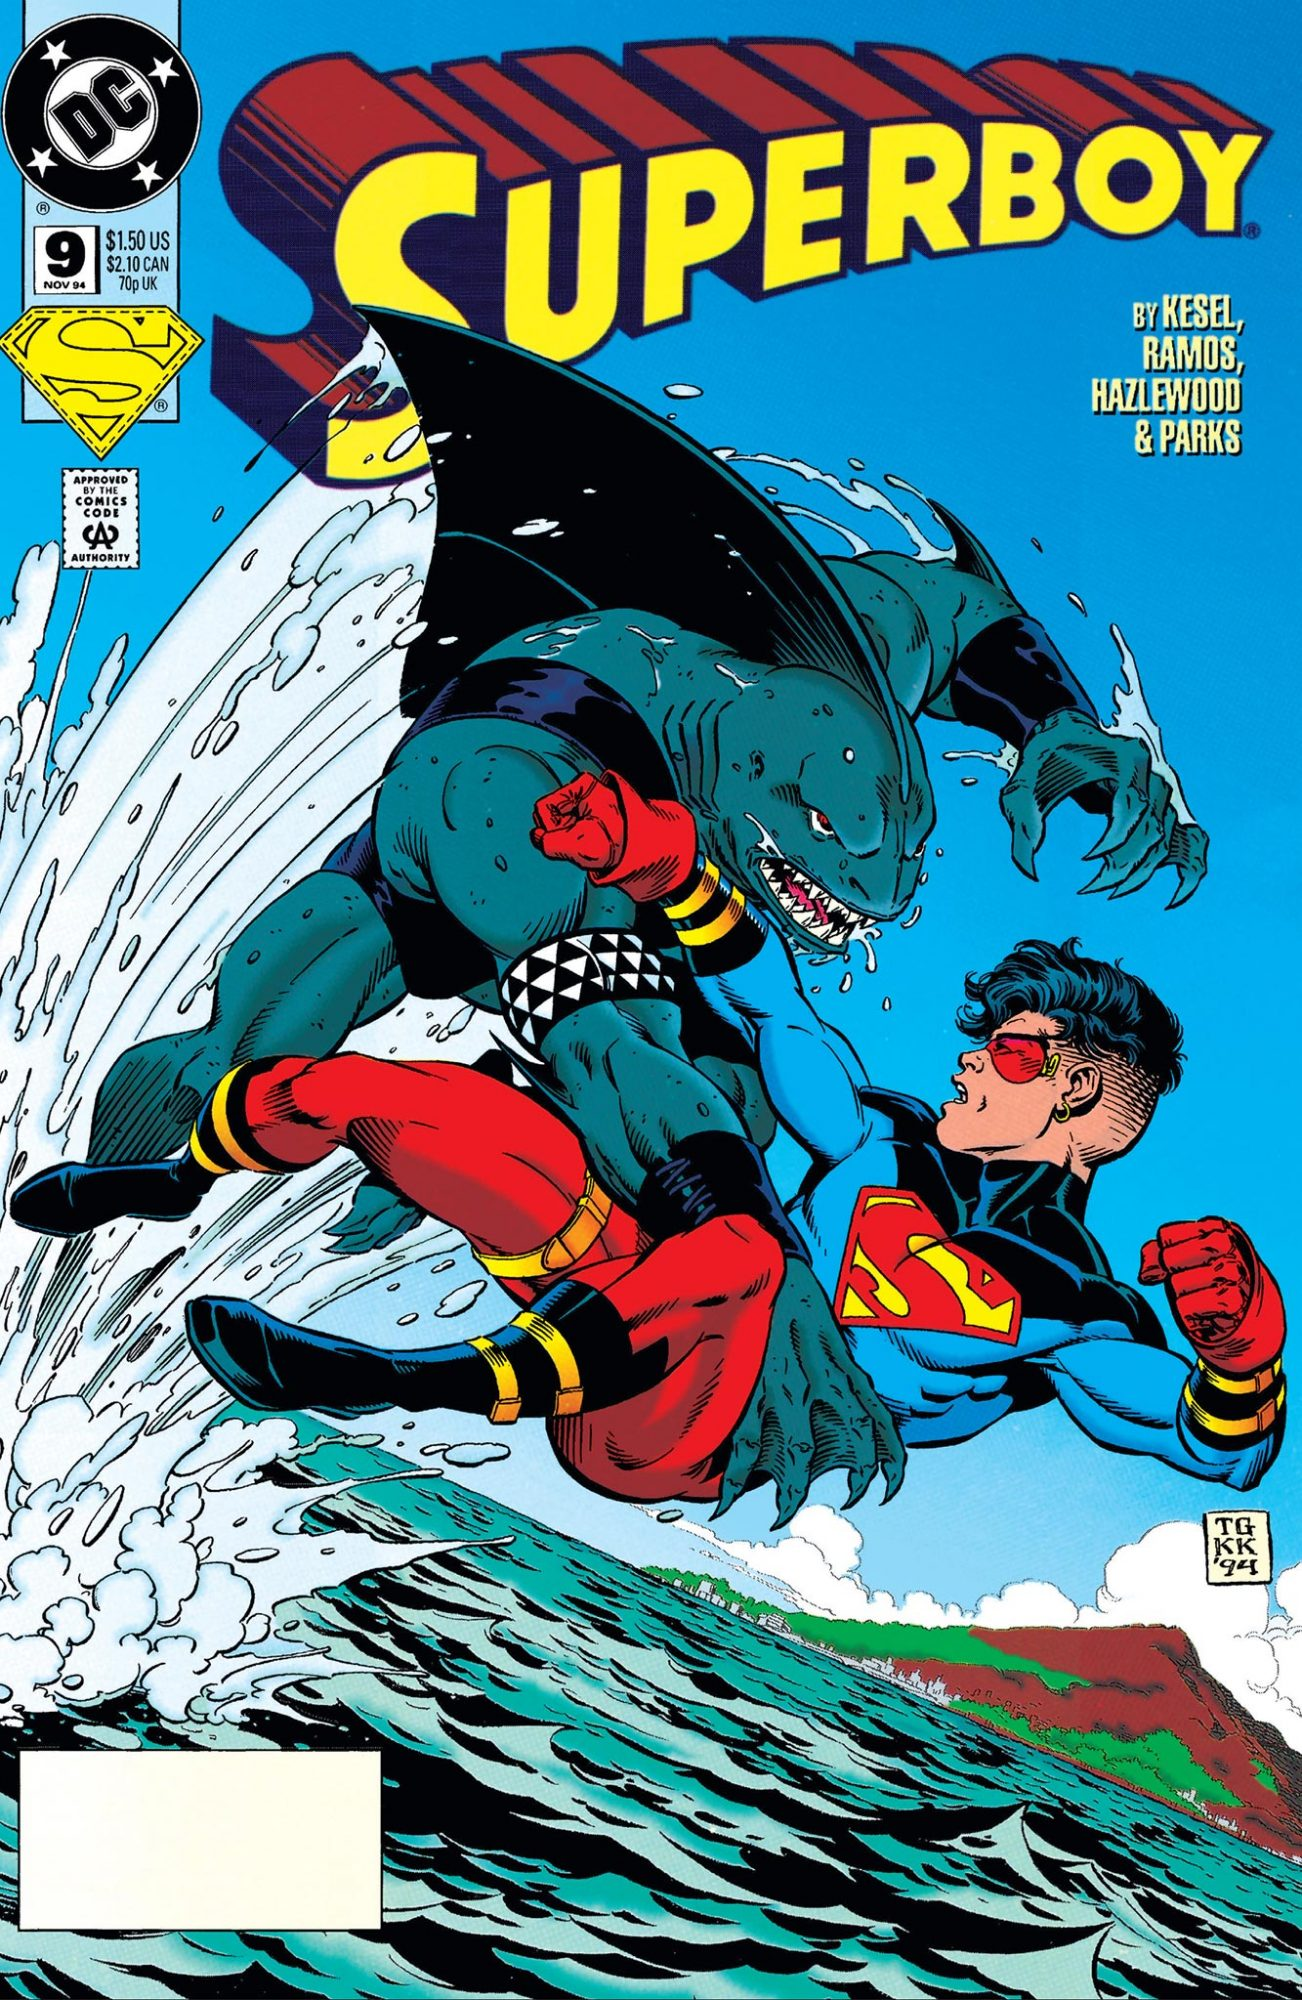 King Shark comics